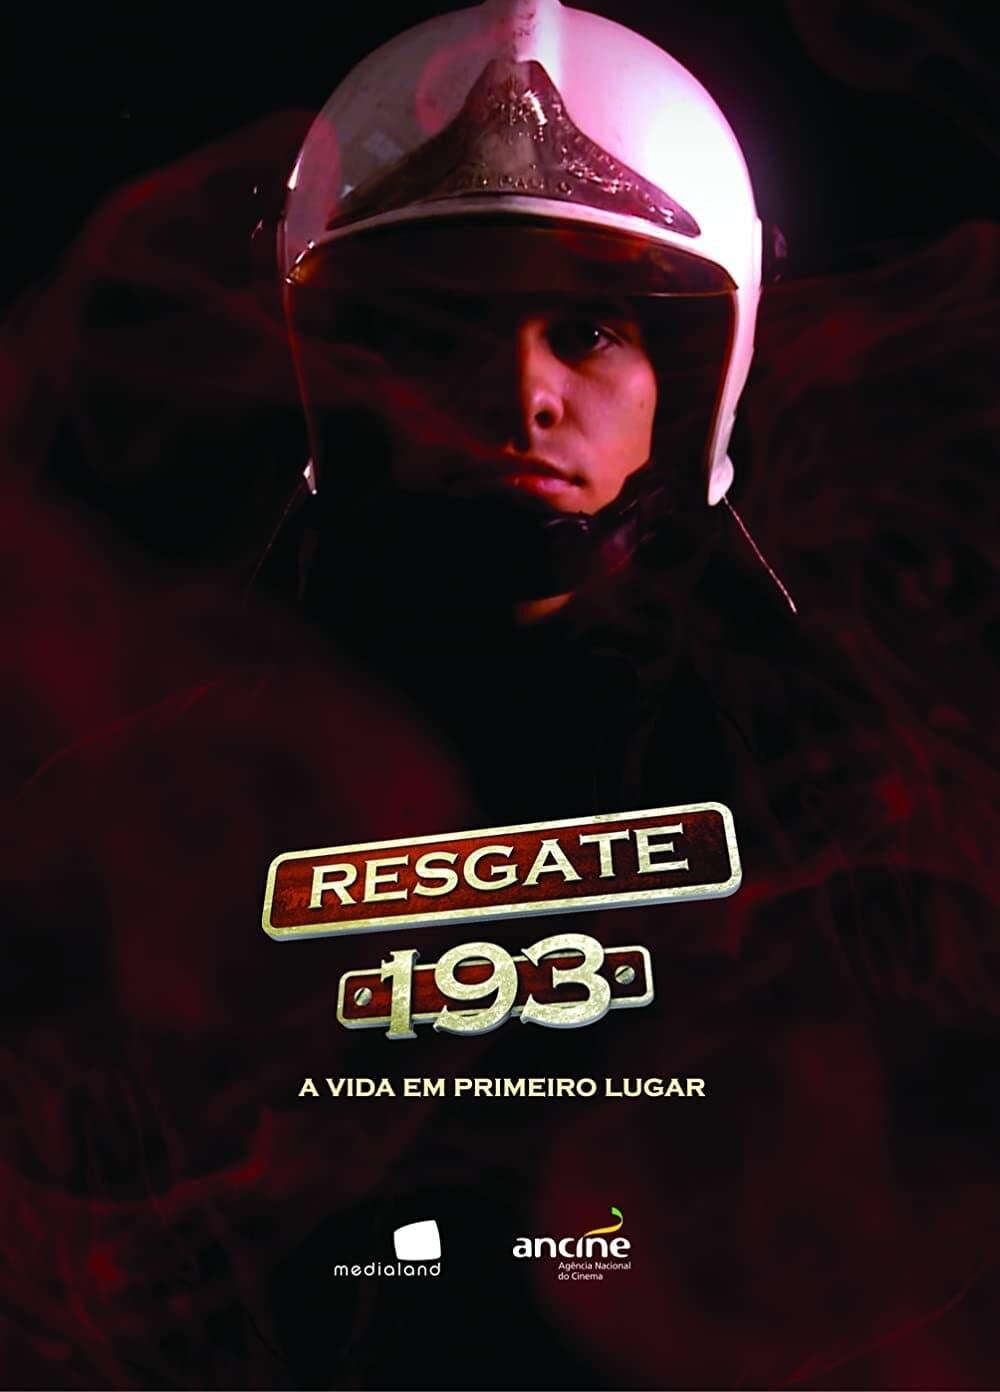 Resgate 193